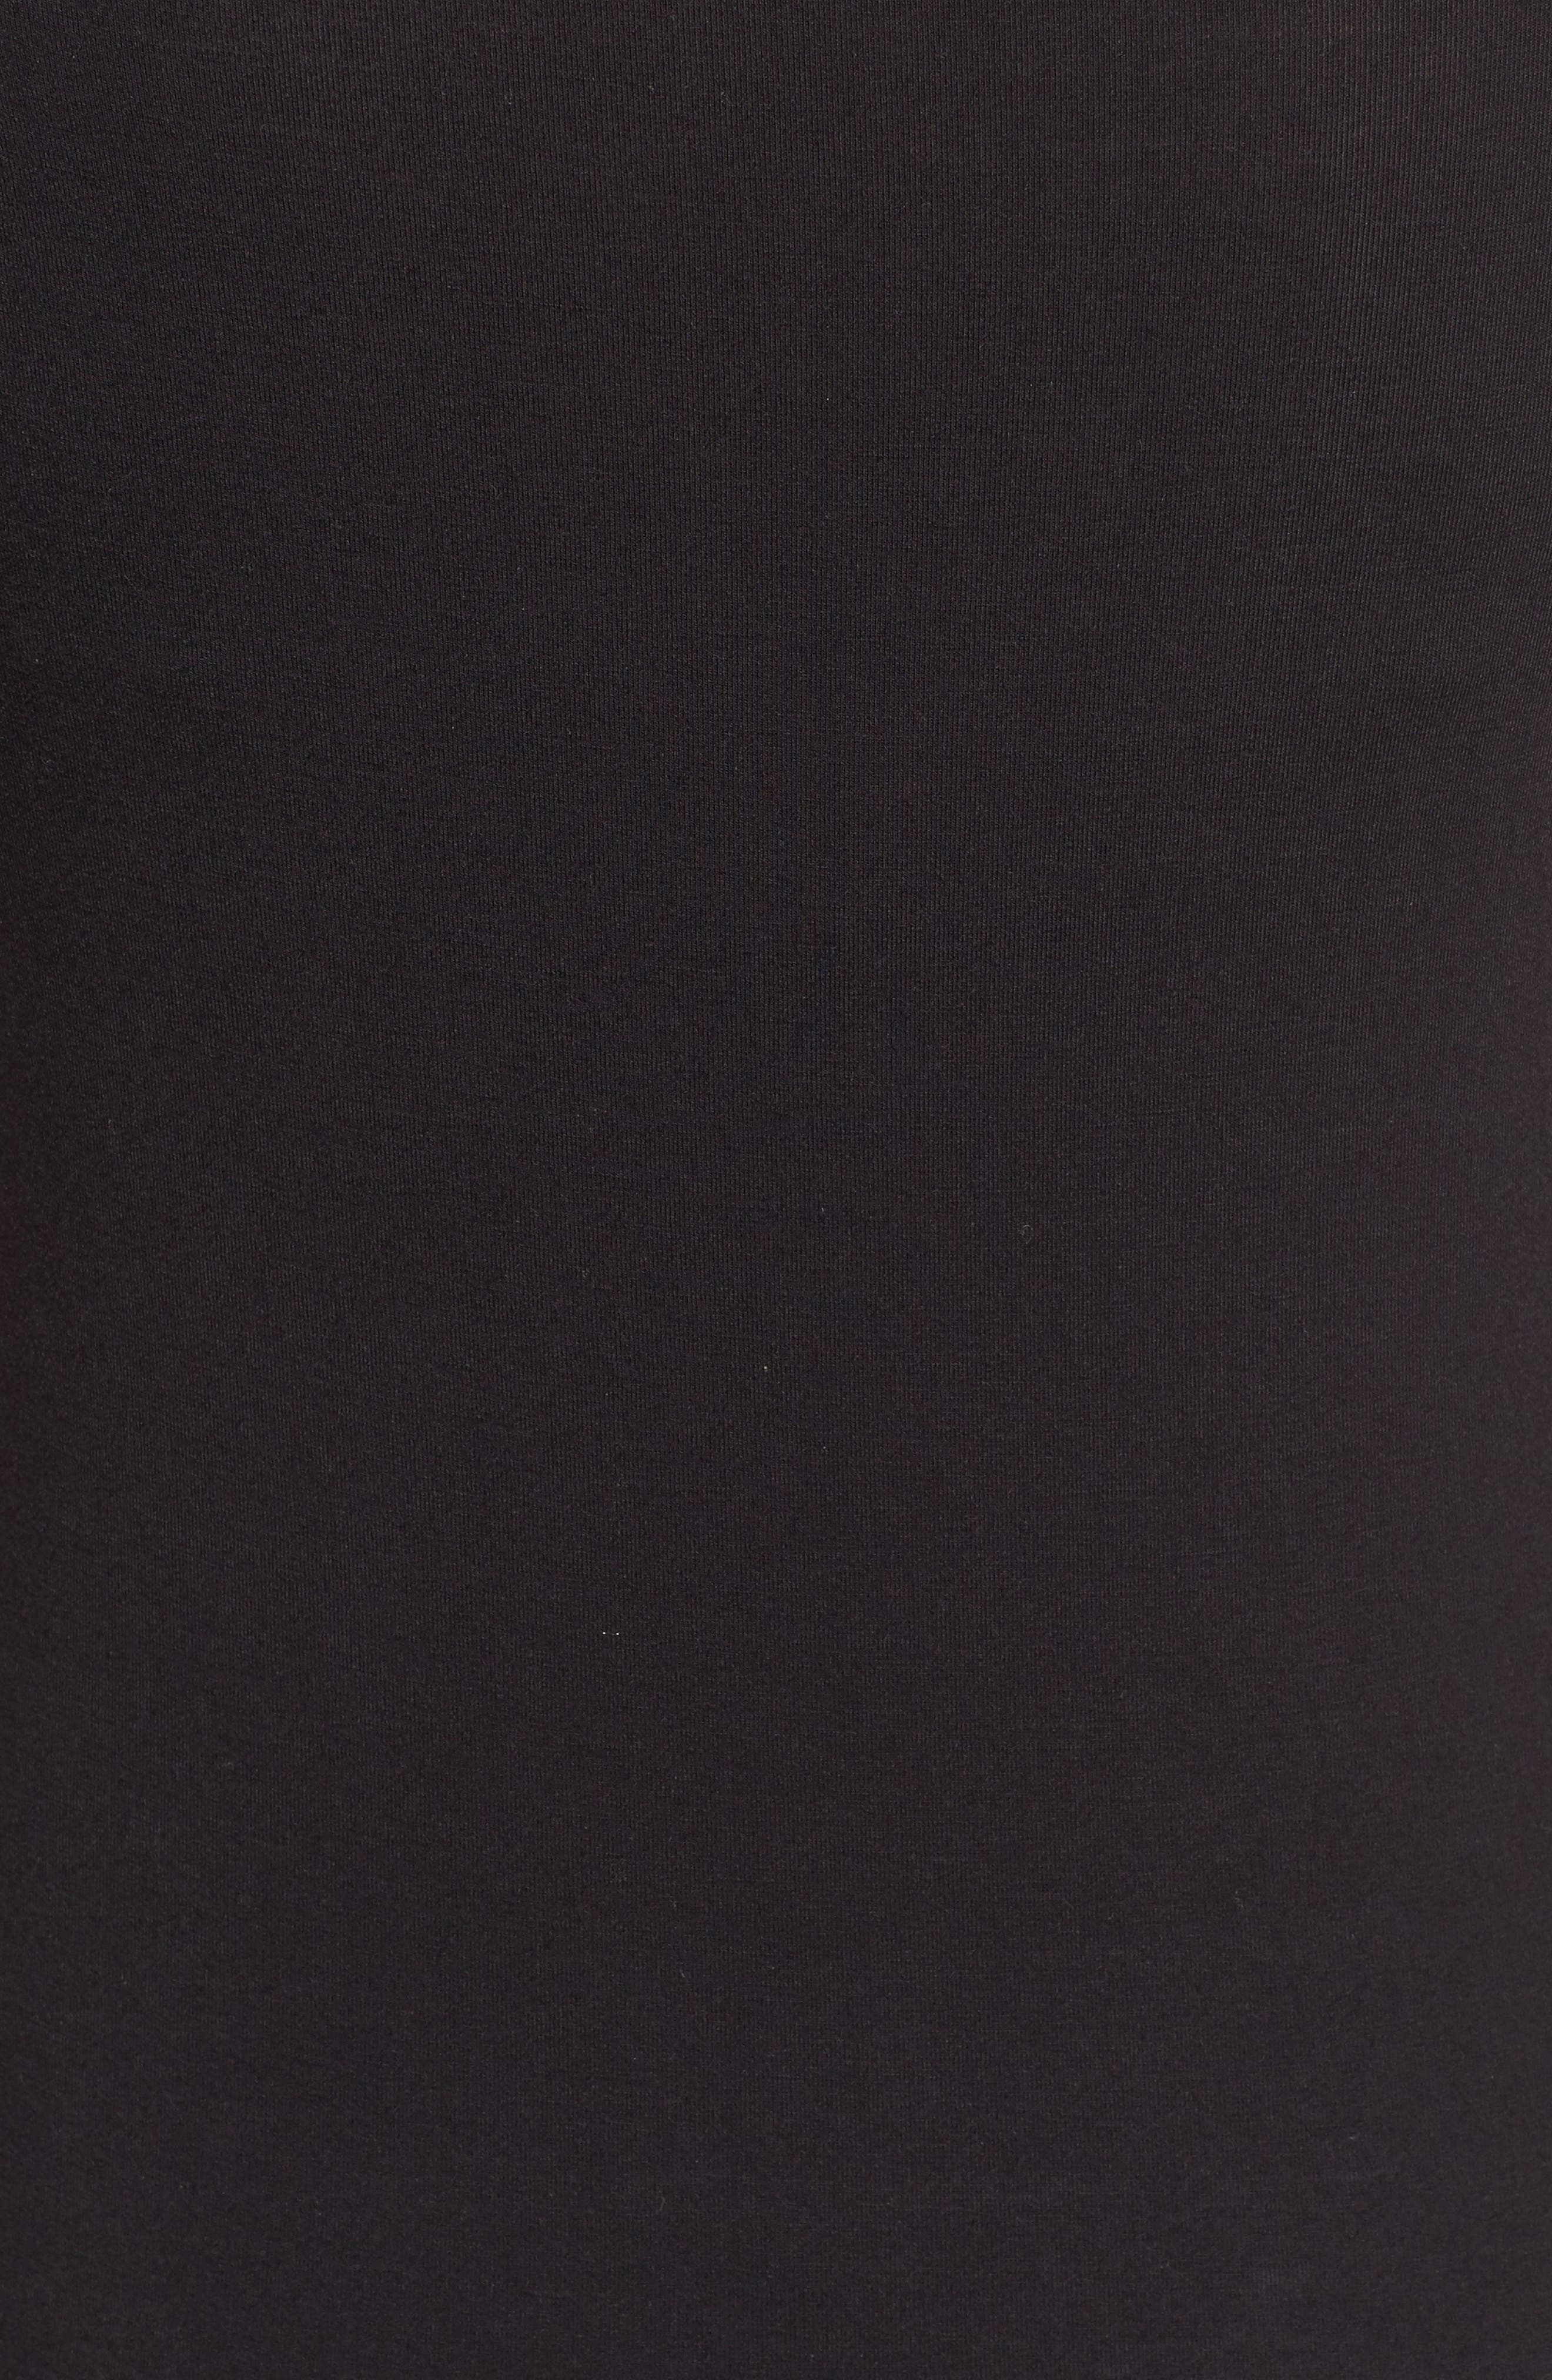 'Deneuve' Cold Shoulder Top,                             Alternate thumbnail 6, color,                             001